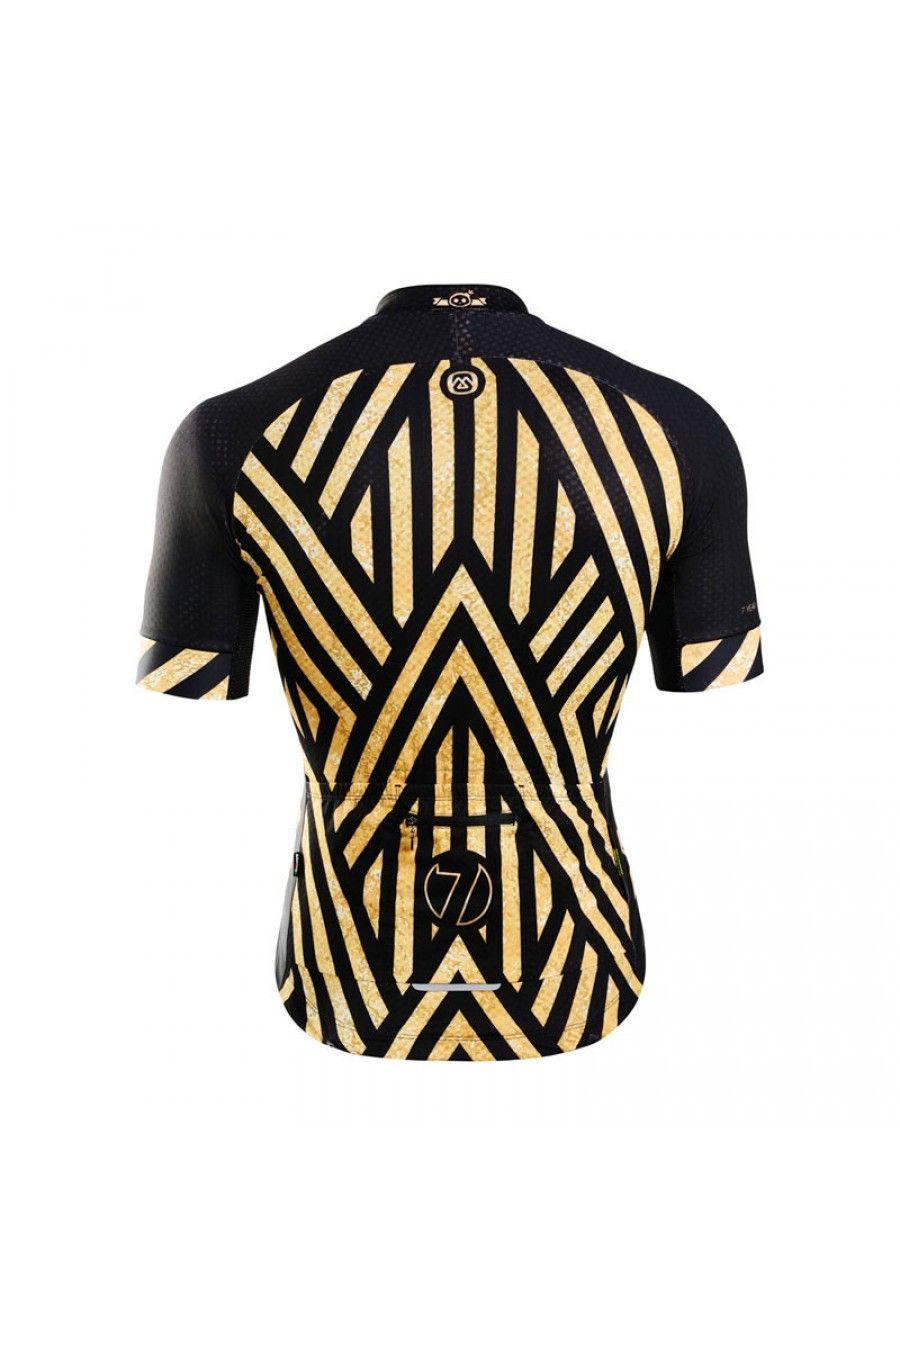 Cool Bike Jersey Bike Jersey Cycling Outfit Biking Outfit